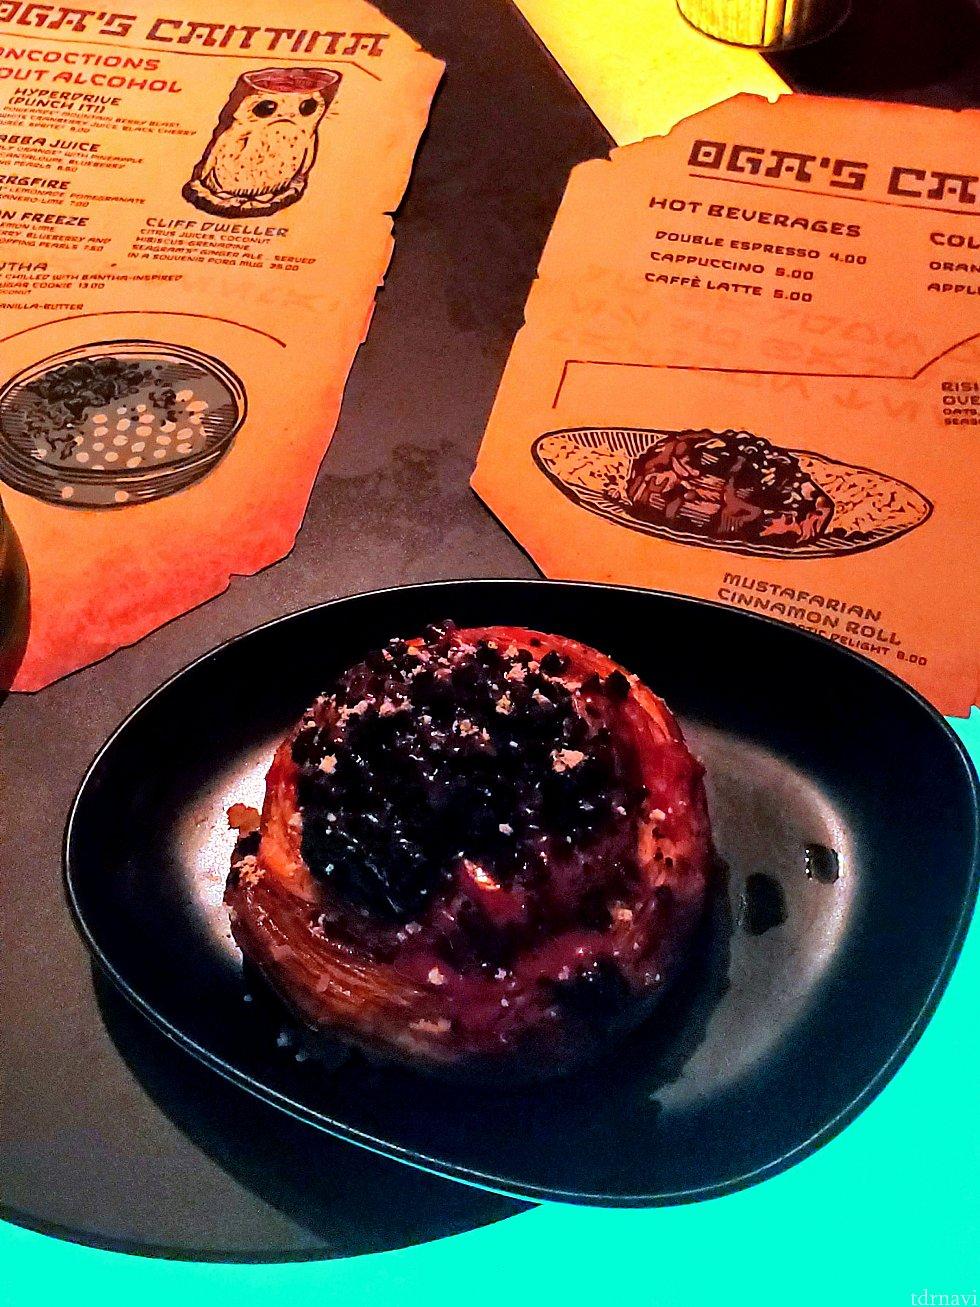 Mustafarian Cinnamon Roll  $6.00